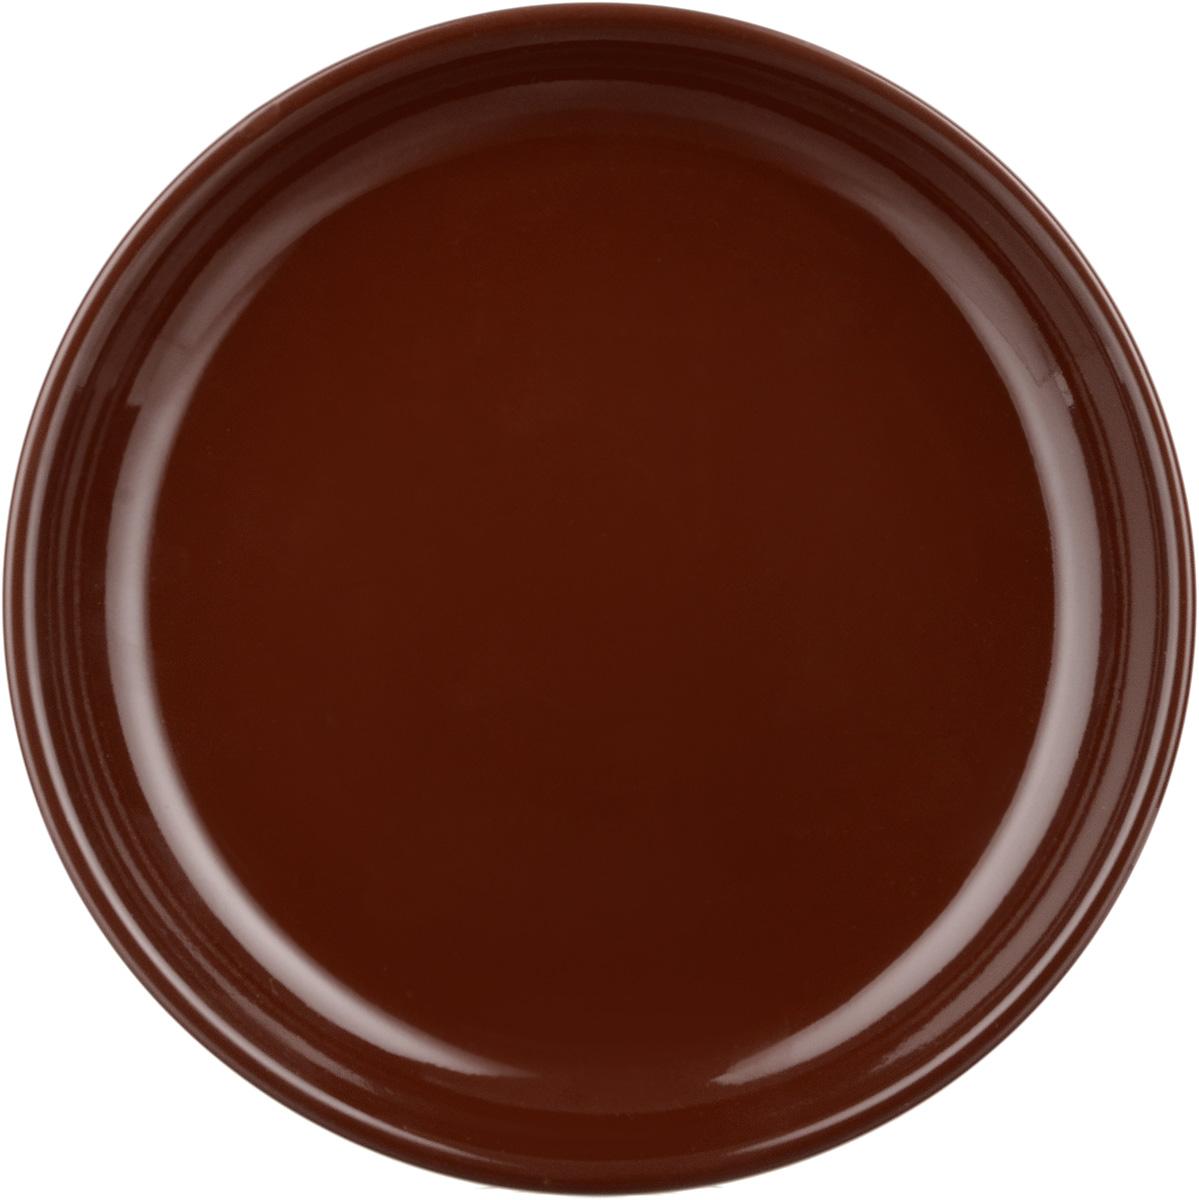 "Тарелка Борисовская керамика ""Cтандарт"", цвет: темно-коричневый, диаметр 18 см"